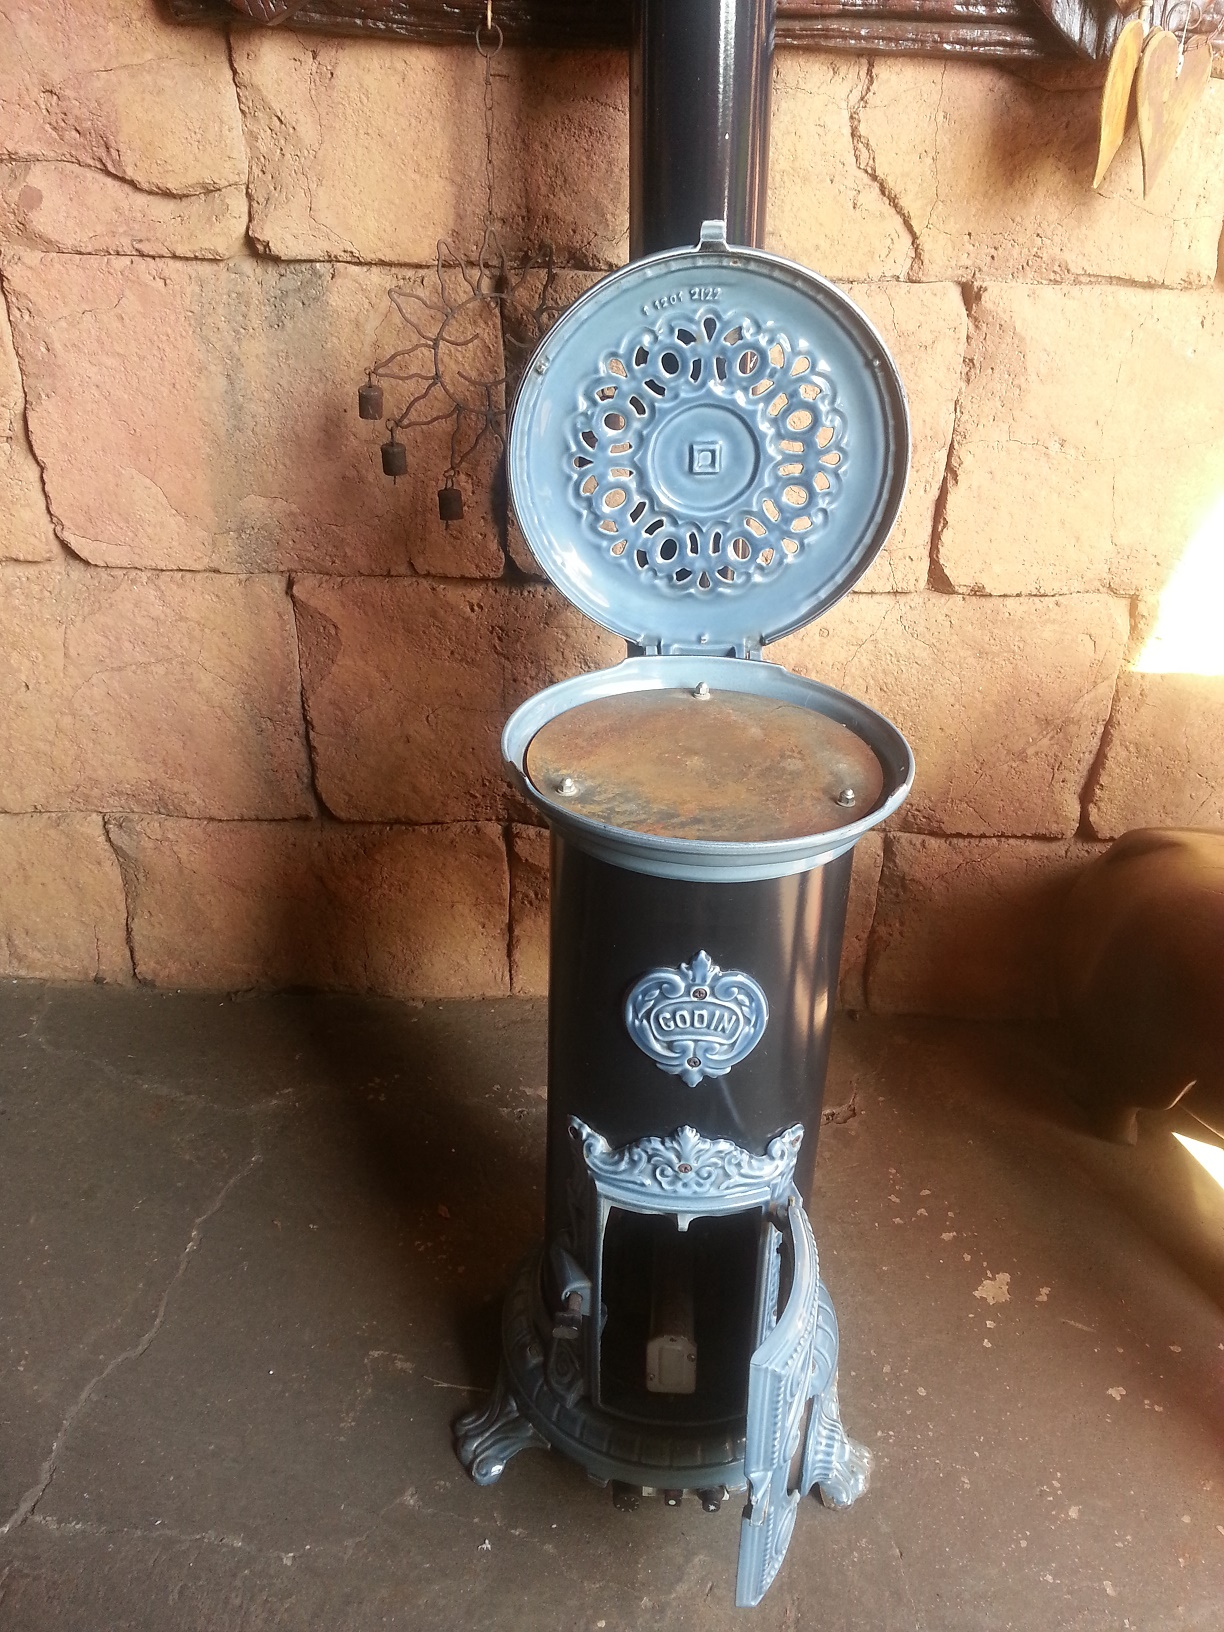 Godin Cast Iron Enammelled Gas Stove Heater